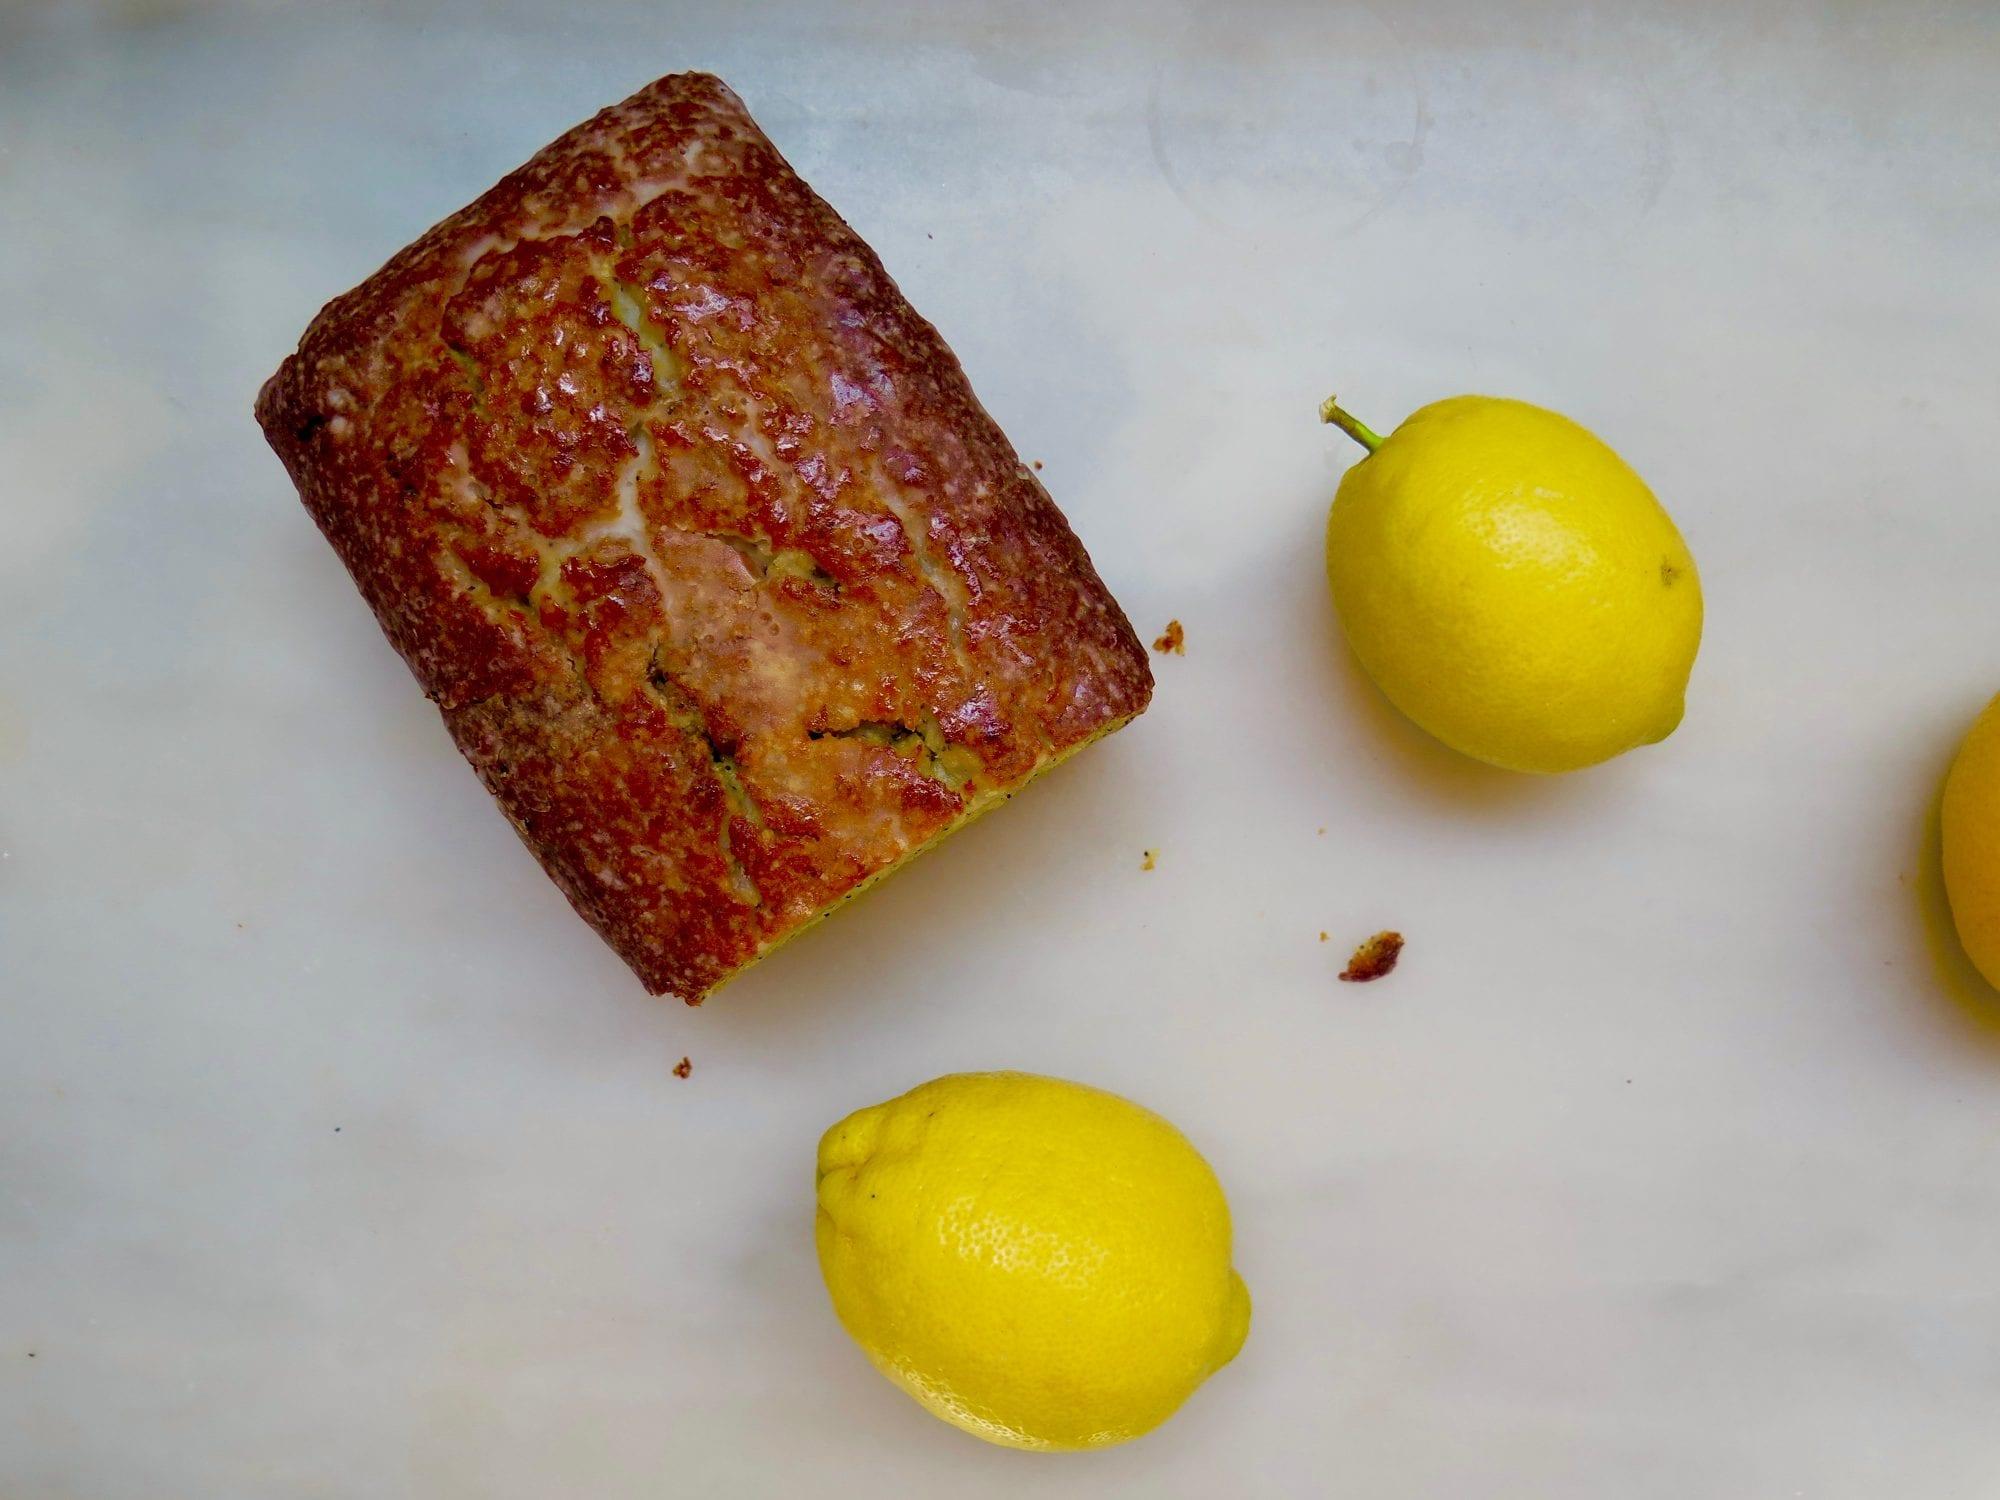 Glazed Lemon Poppy Seed Cake | Jessie Sheehan Bakes